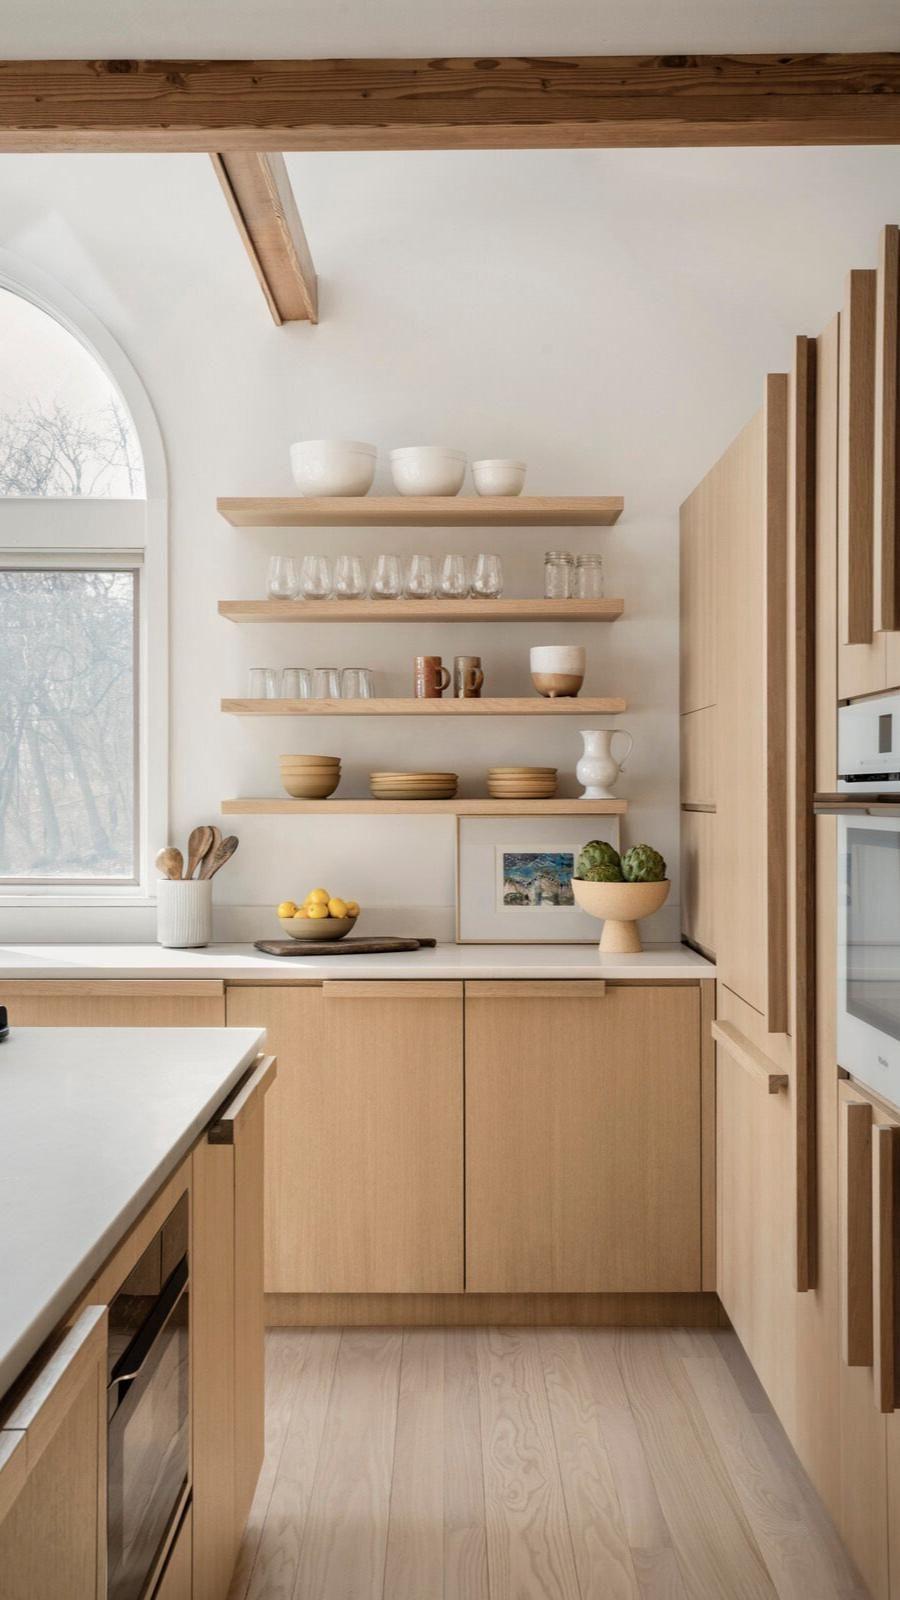 Kitchen Organization Shelf